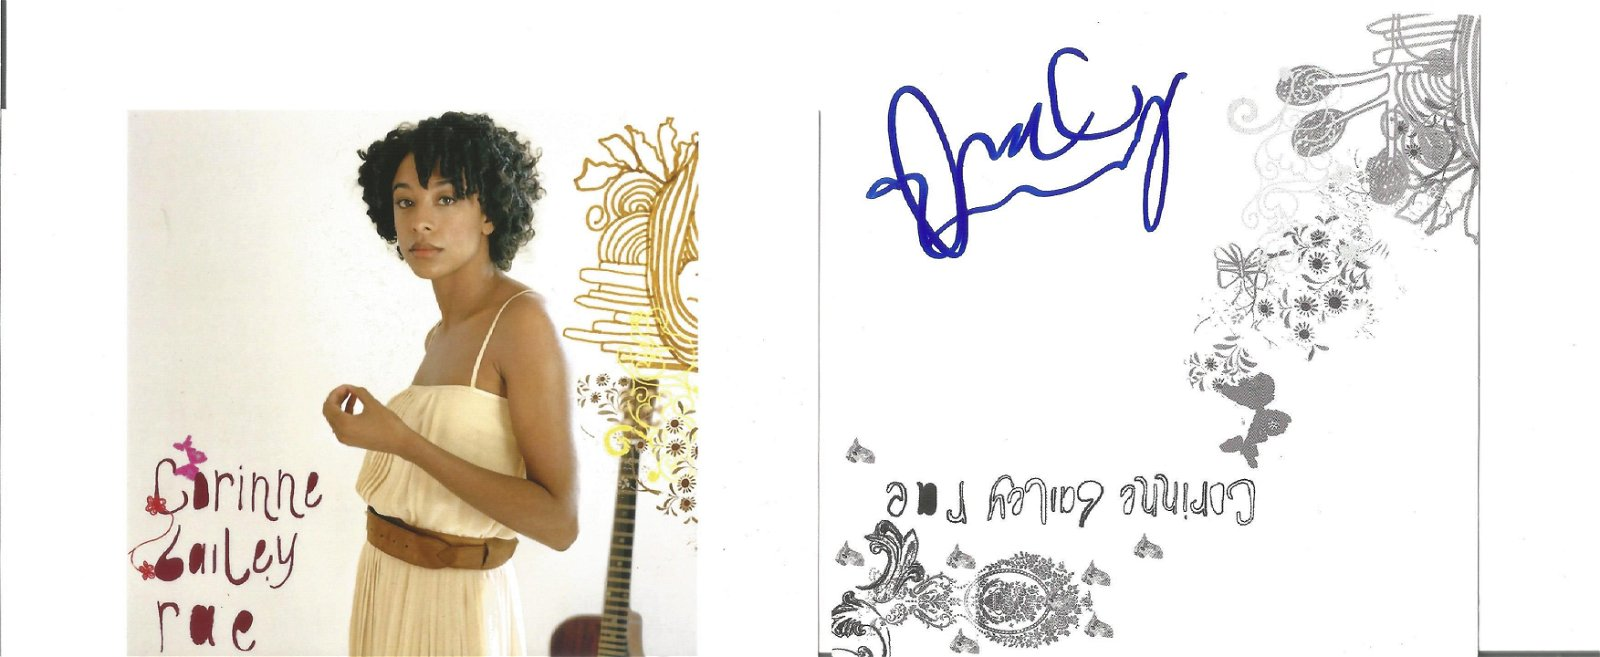 Corinne Bailey Rae Singer Signed Card Plus Photo . Good